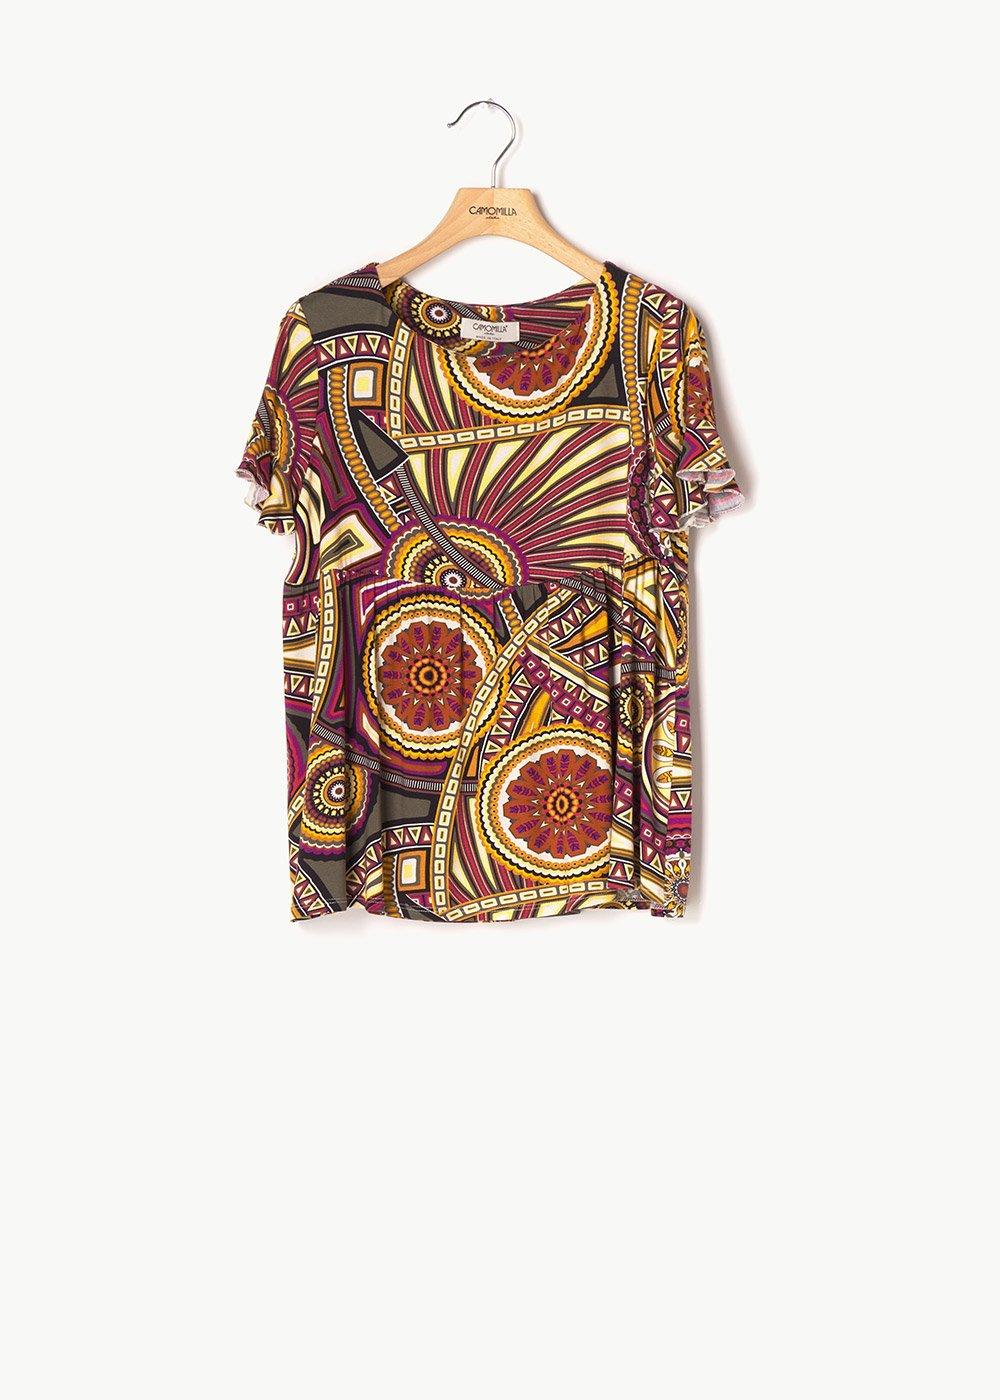 Soemy patterned T-shirt - Aragosta / Timo Fantasia - Woman